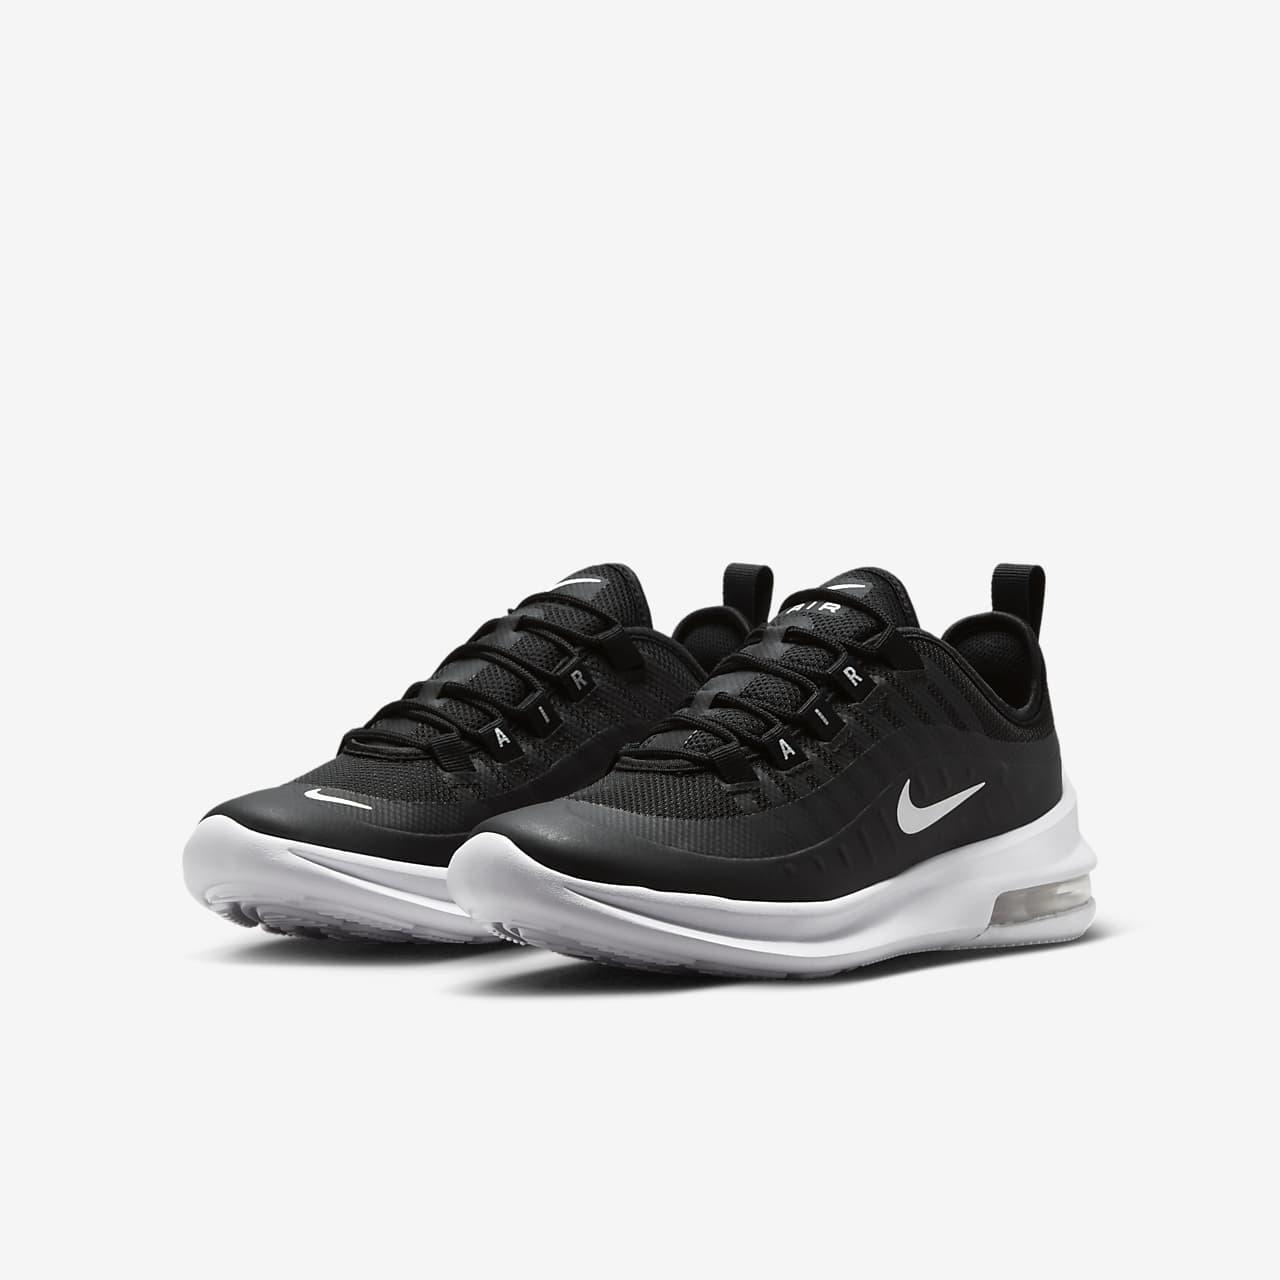 Nike Axe Air Max - Enfants Noir / Blanc bsncMKnGT